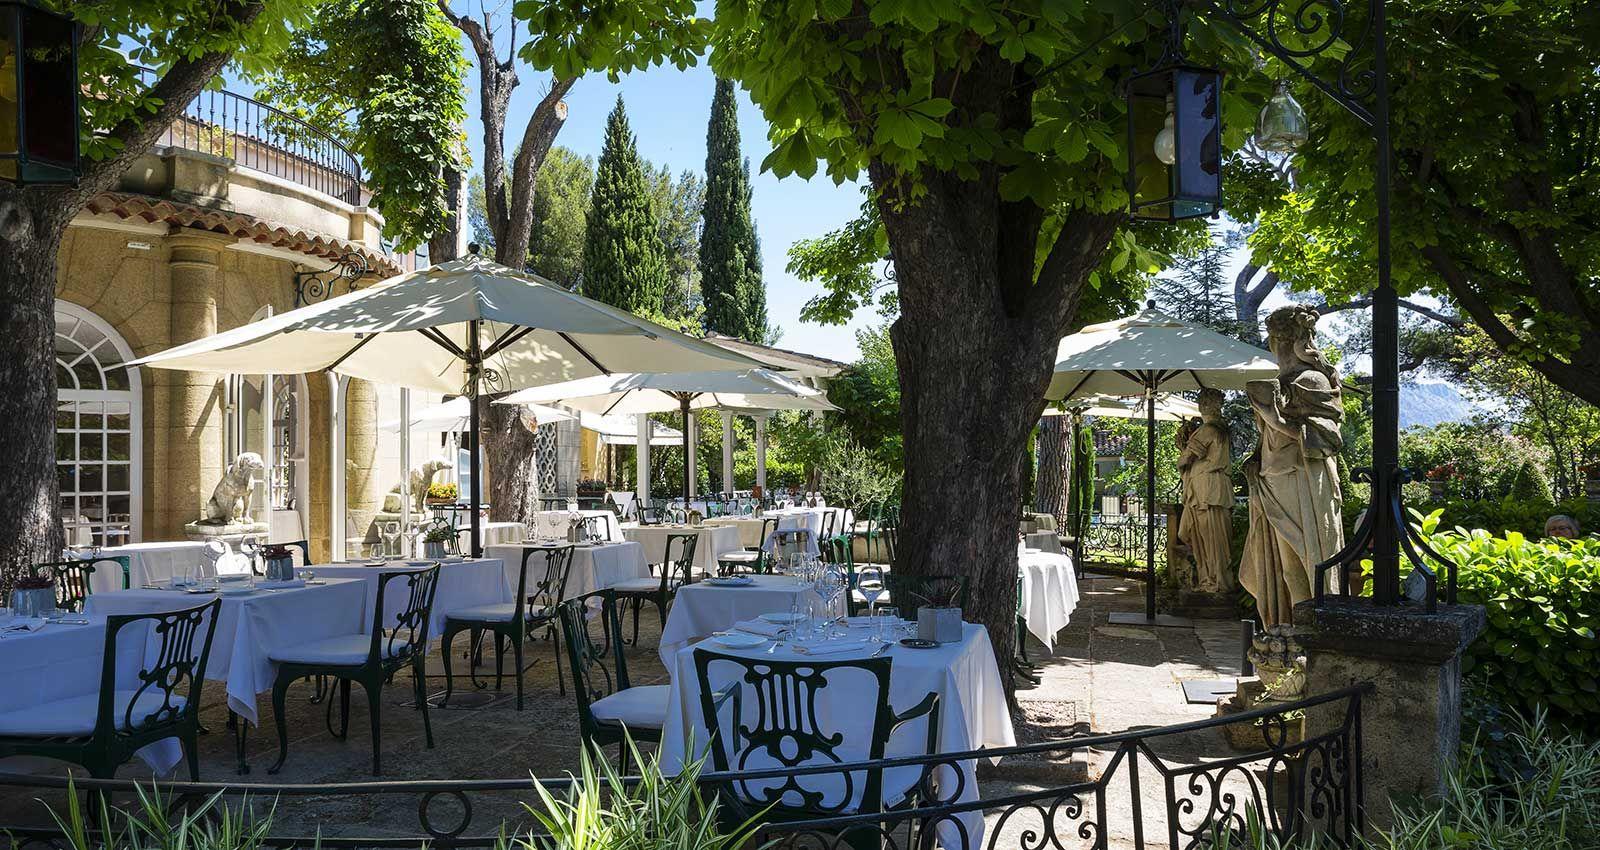 Villa Gallici - Aix-en-Provence - a MICHELIN Guide Restaurant